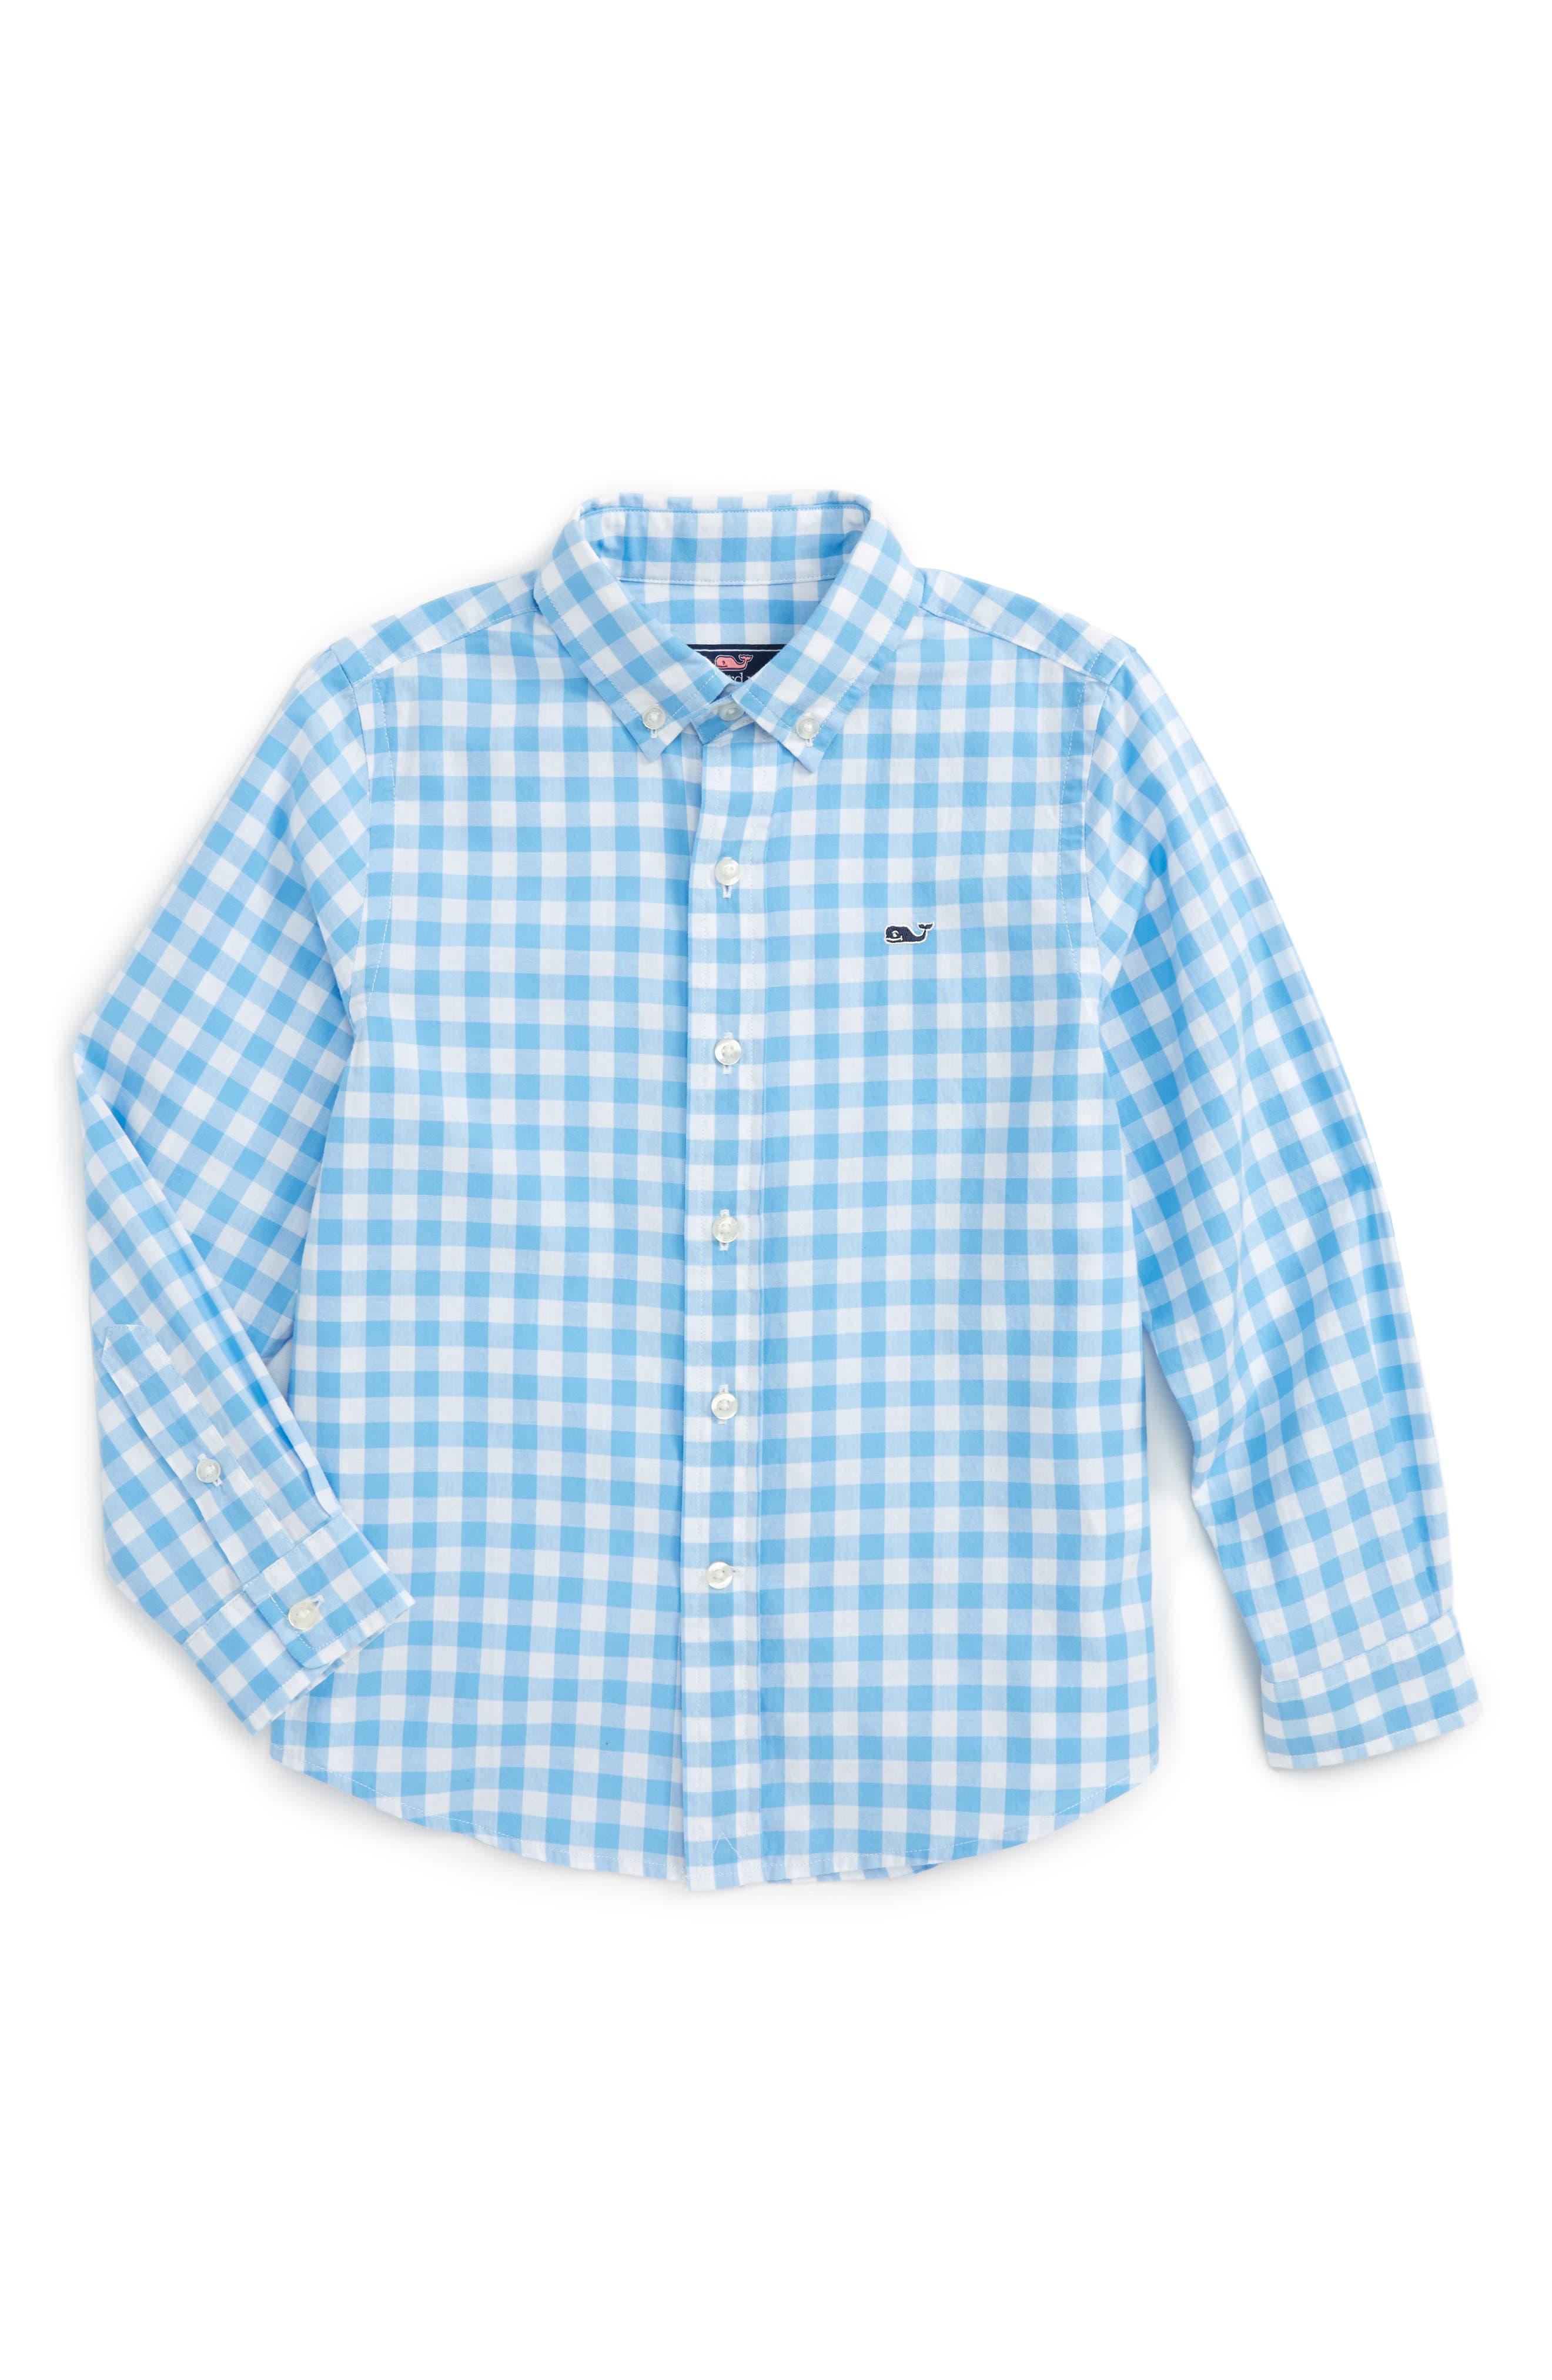 VINEYARD VINES Riverhead Gingham Cotton Shirt